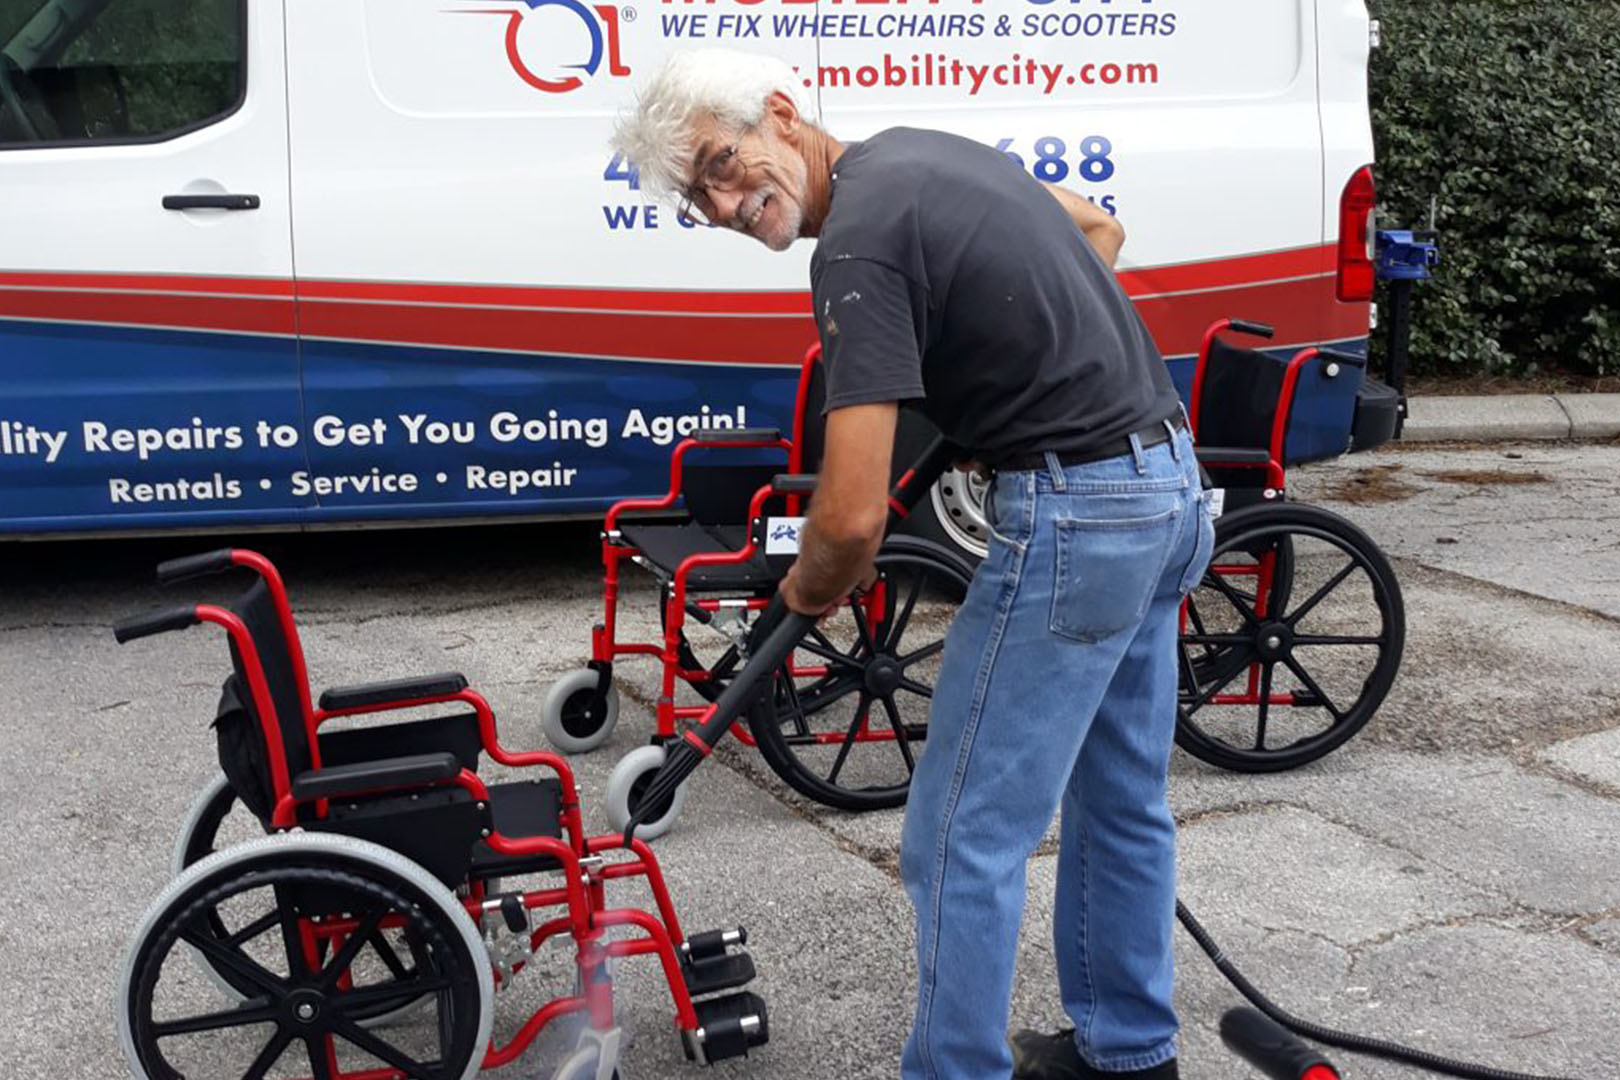 Volunteer cleaning a wheelchair